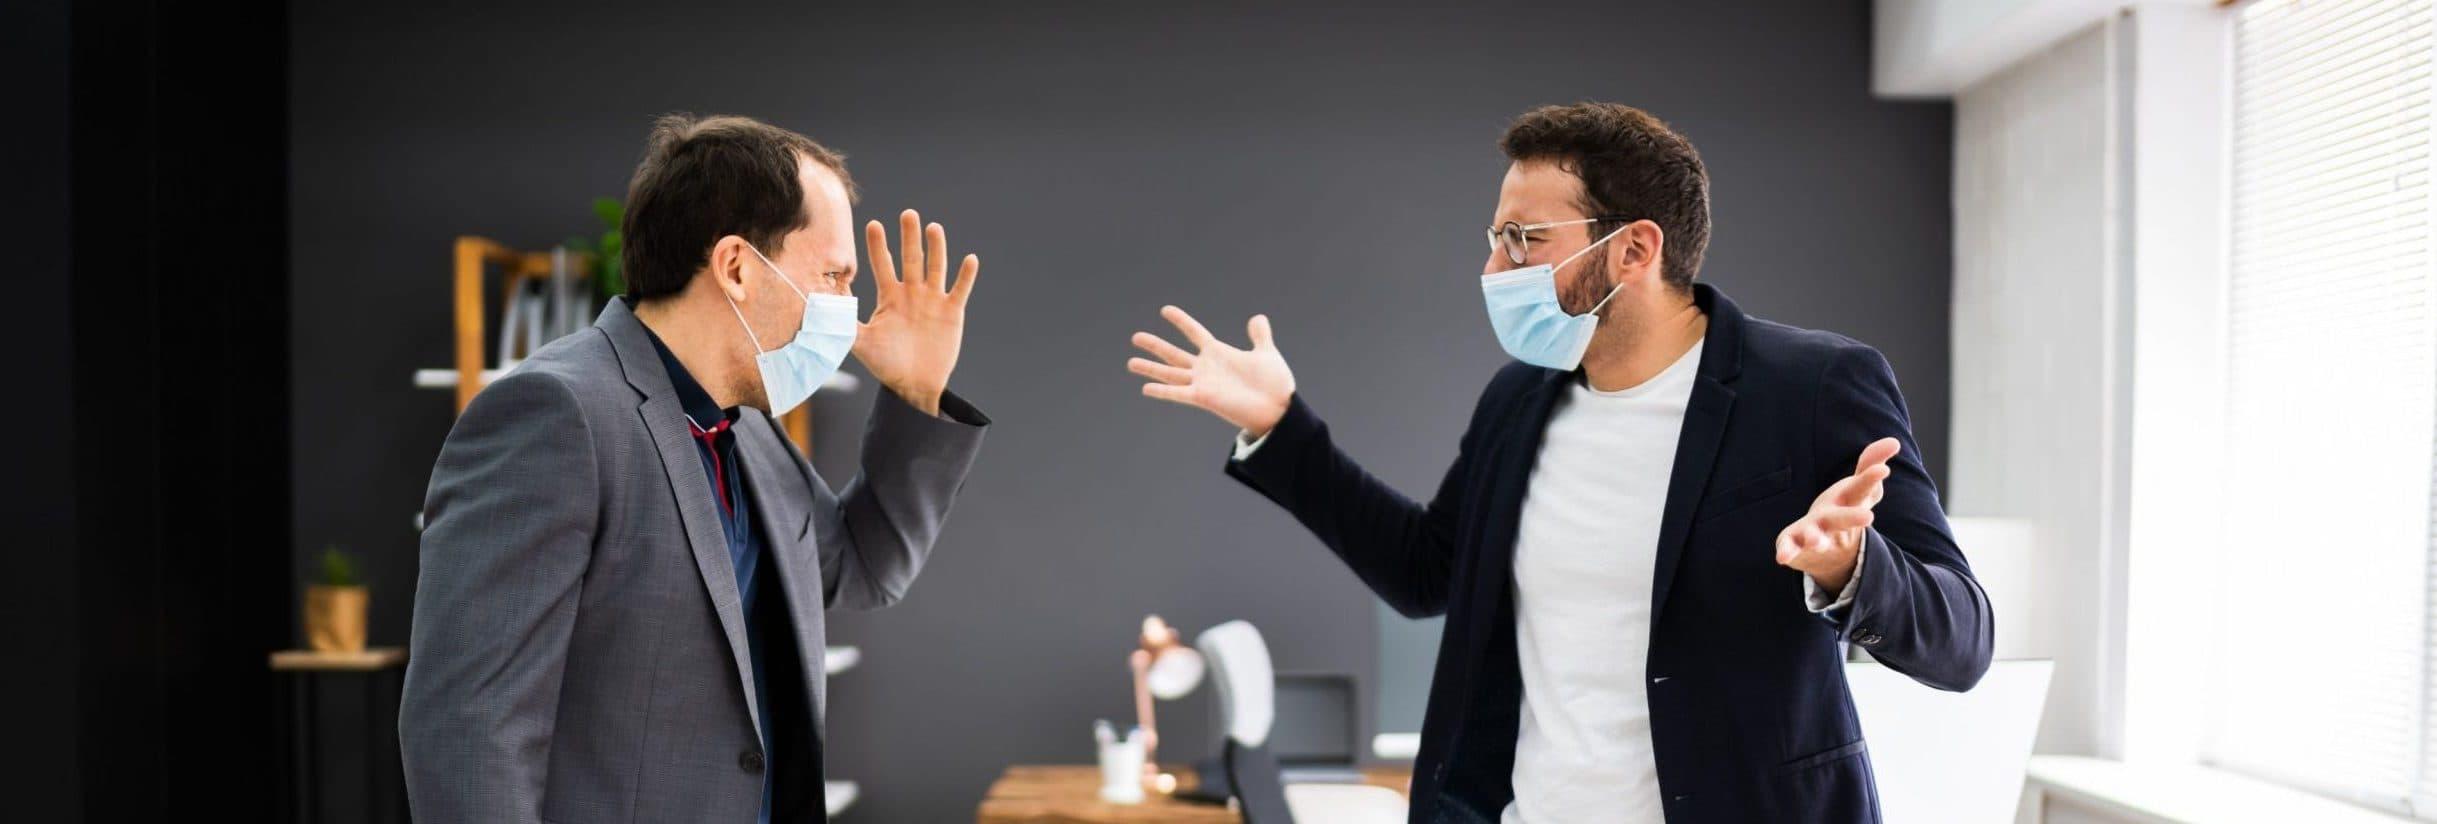 workplace disputes